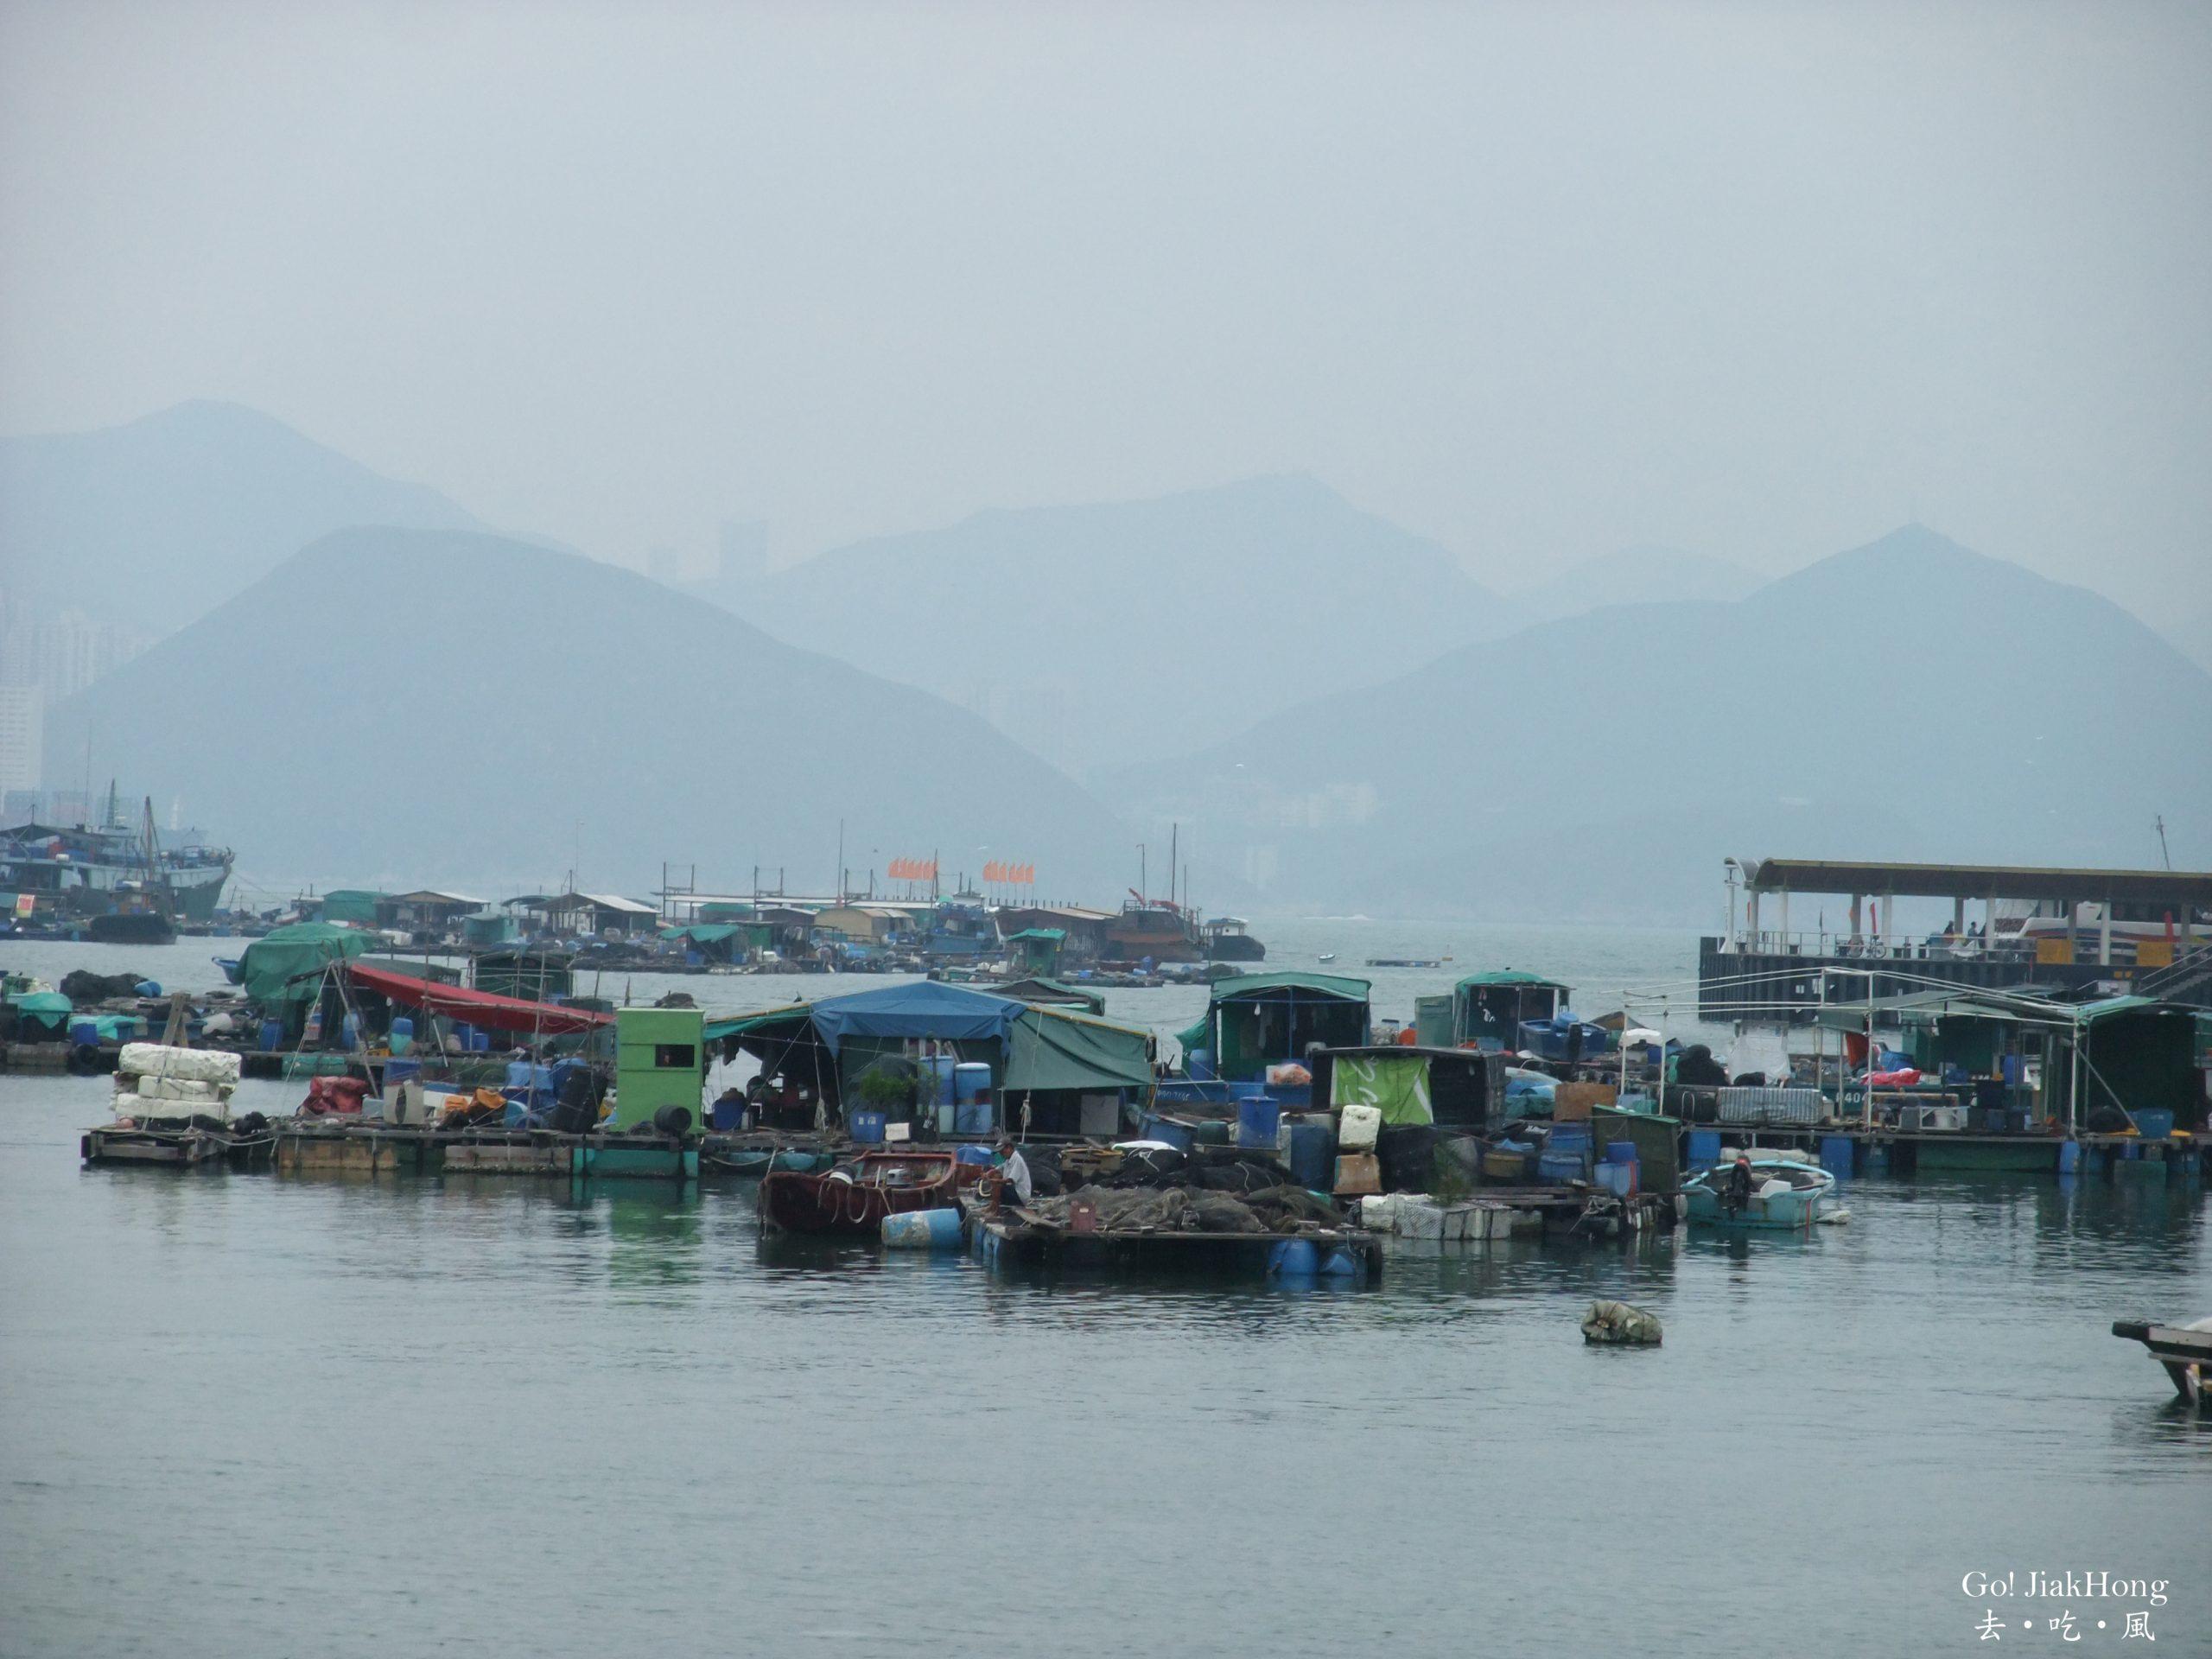 [See, Eat] Hong Kong- One Day out of Hong Kong City to Lamma Island (南丫島)